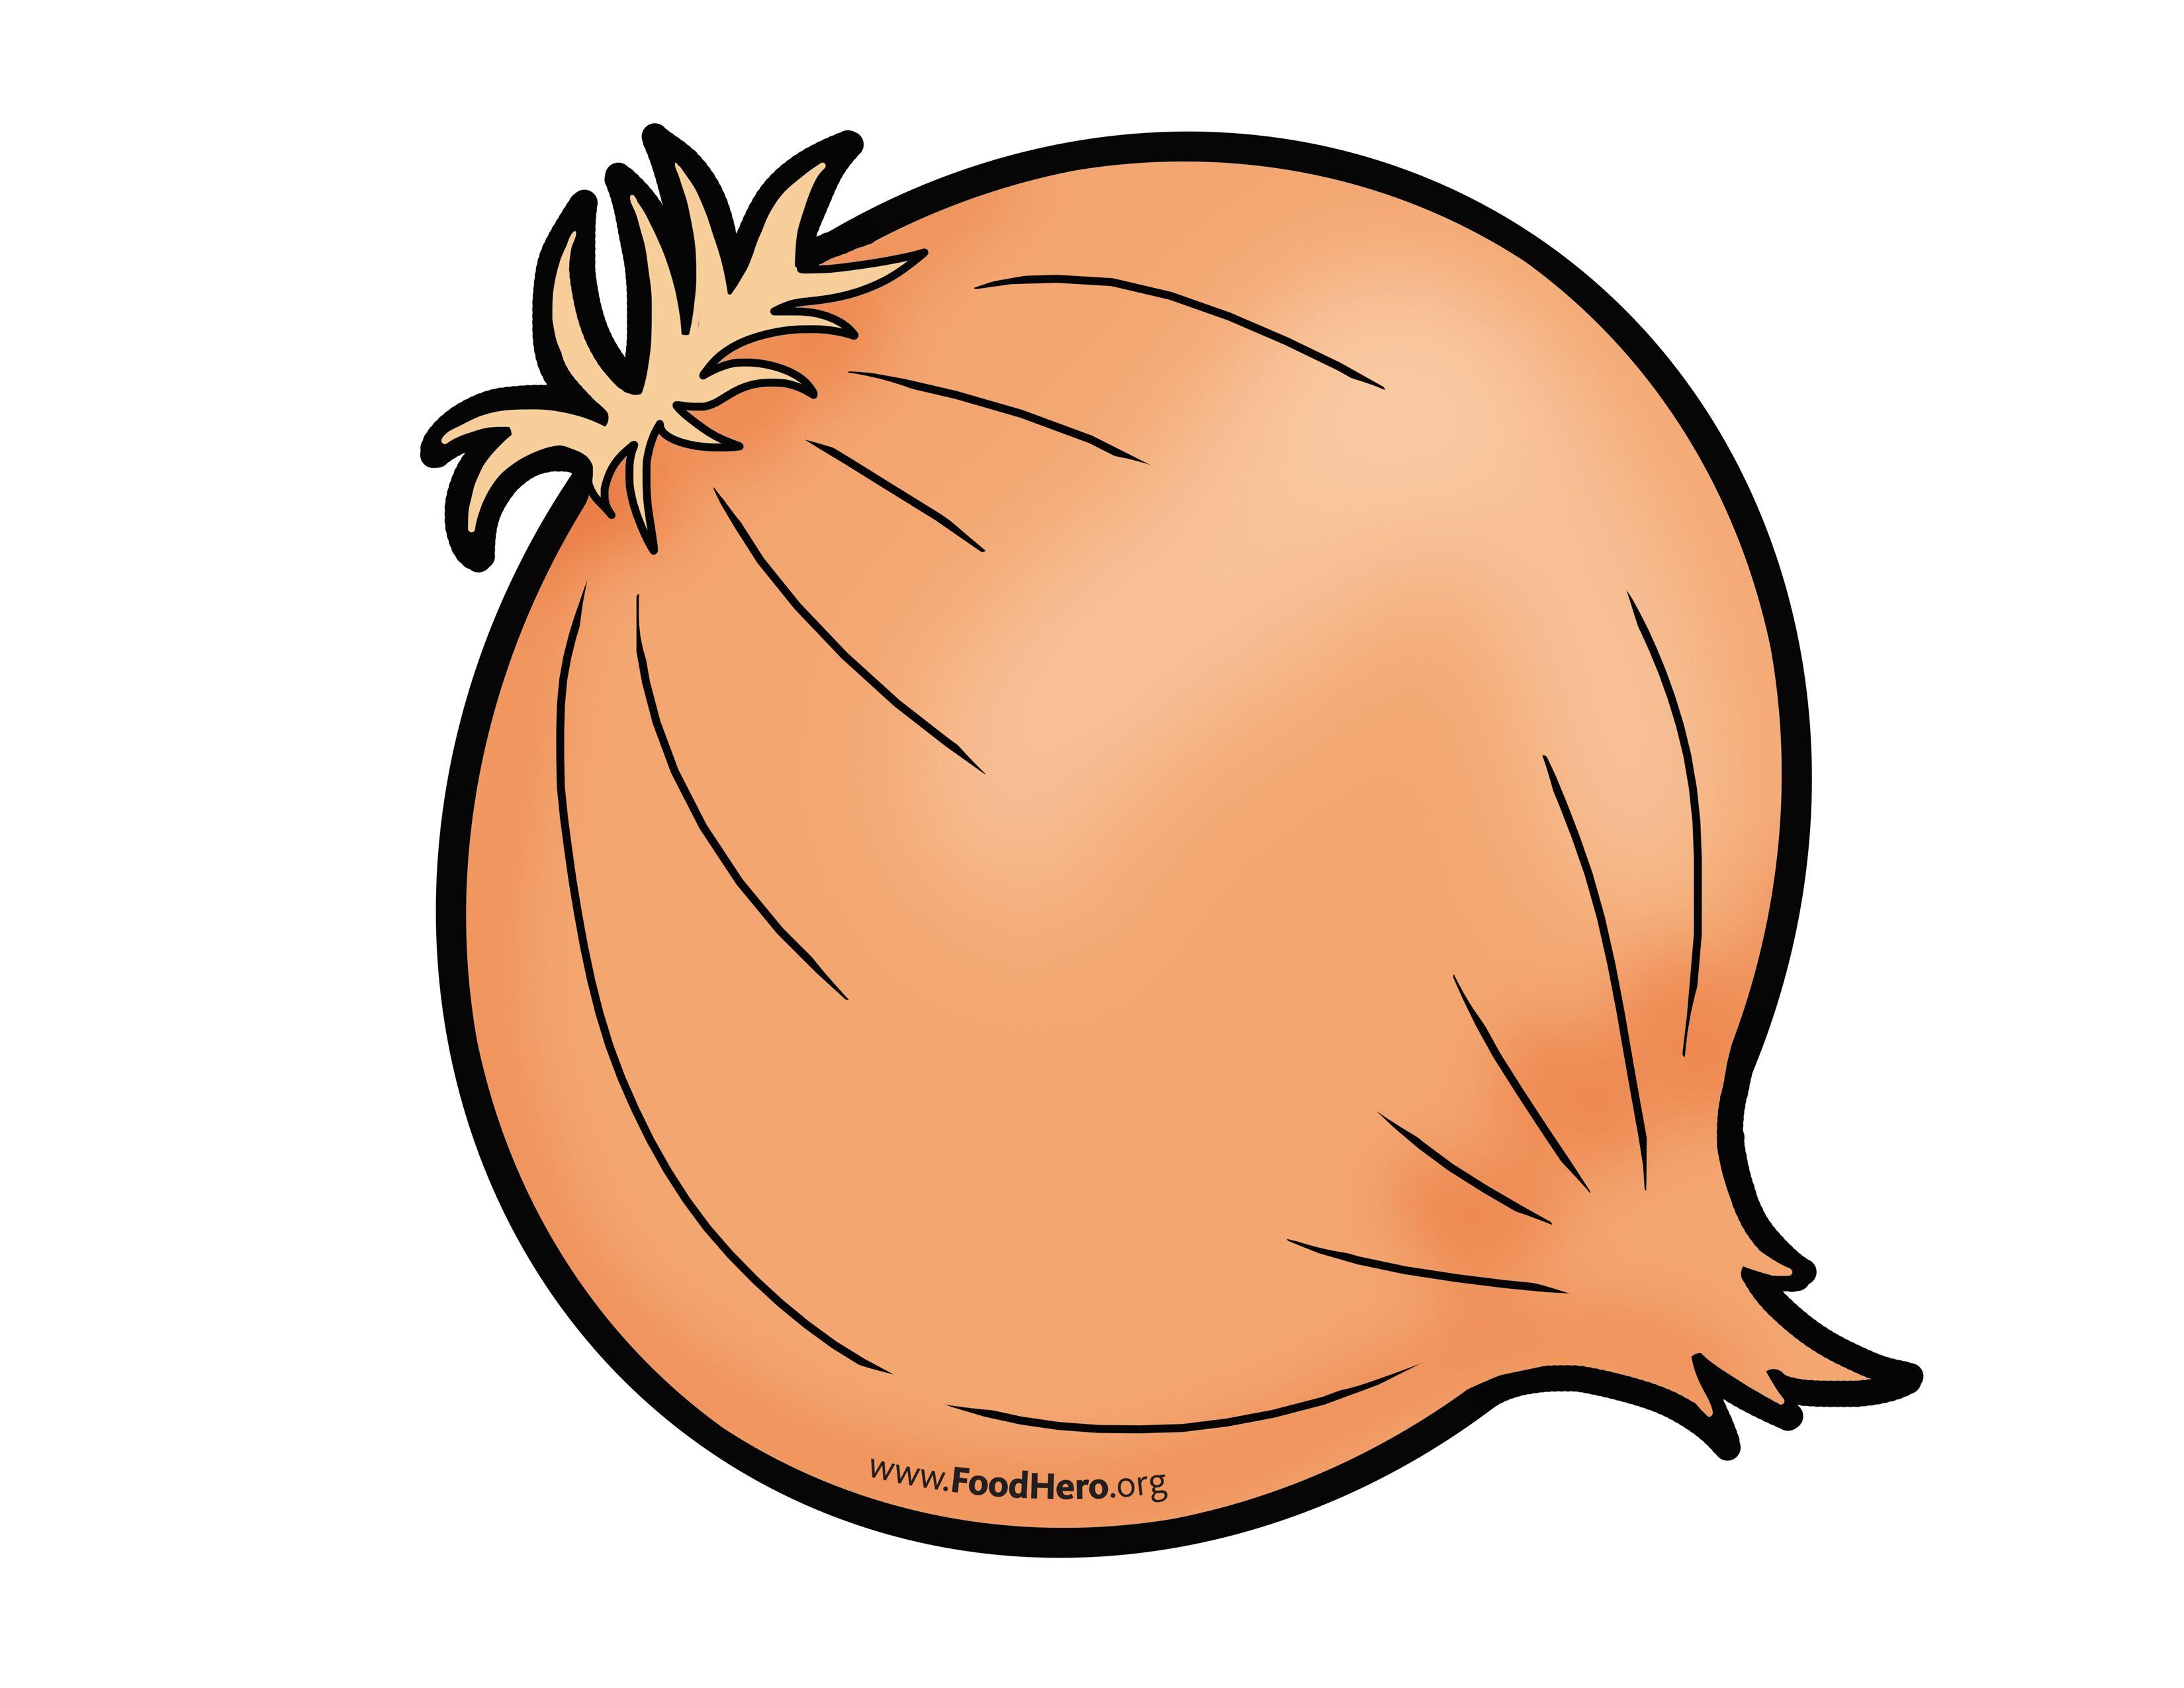 Illustration foodhero bullentinboards schoolart. Onion clipart onion peel